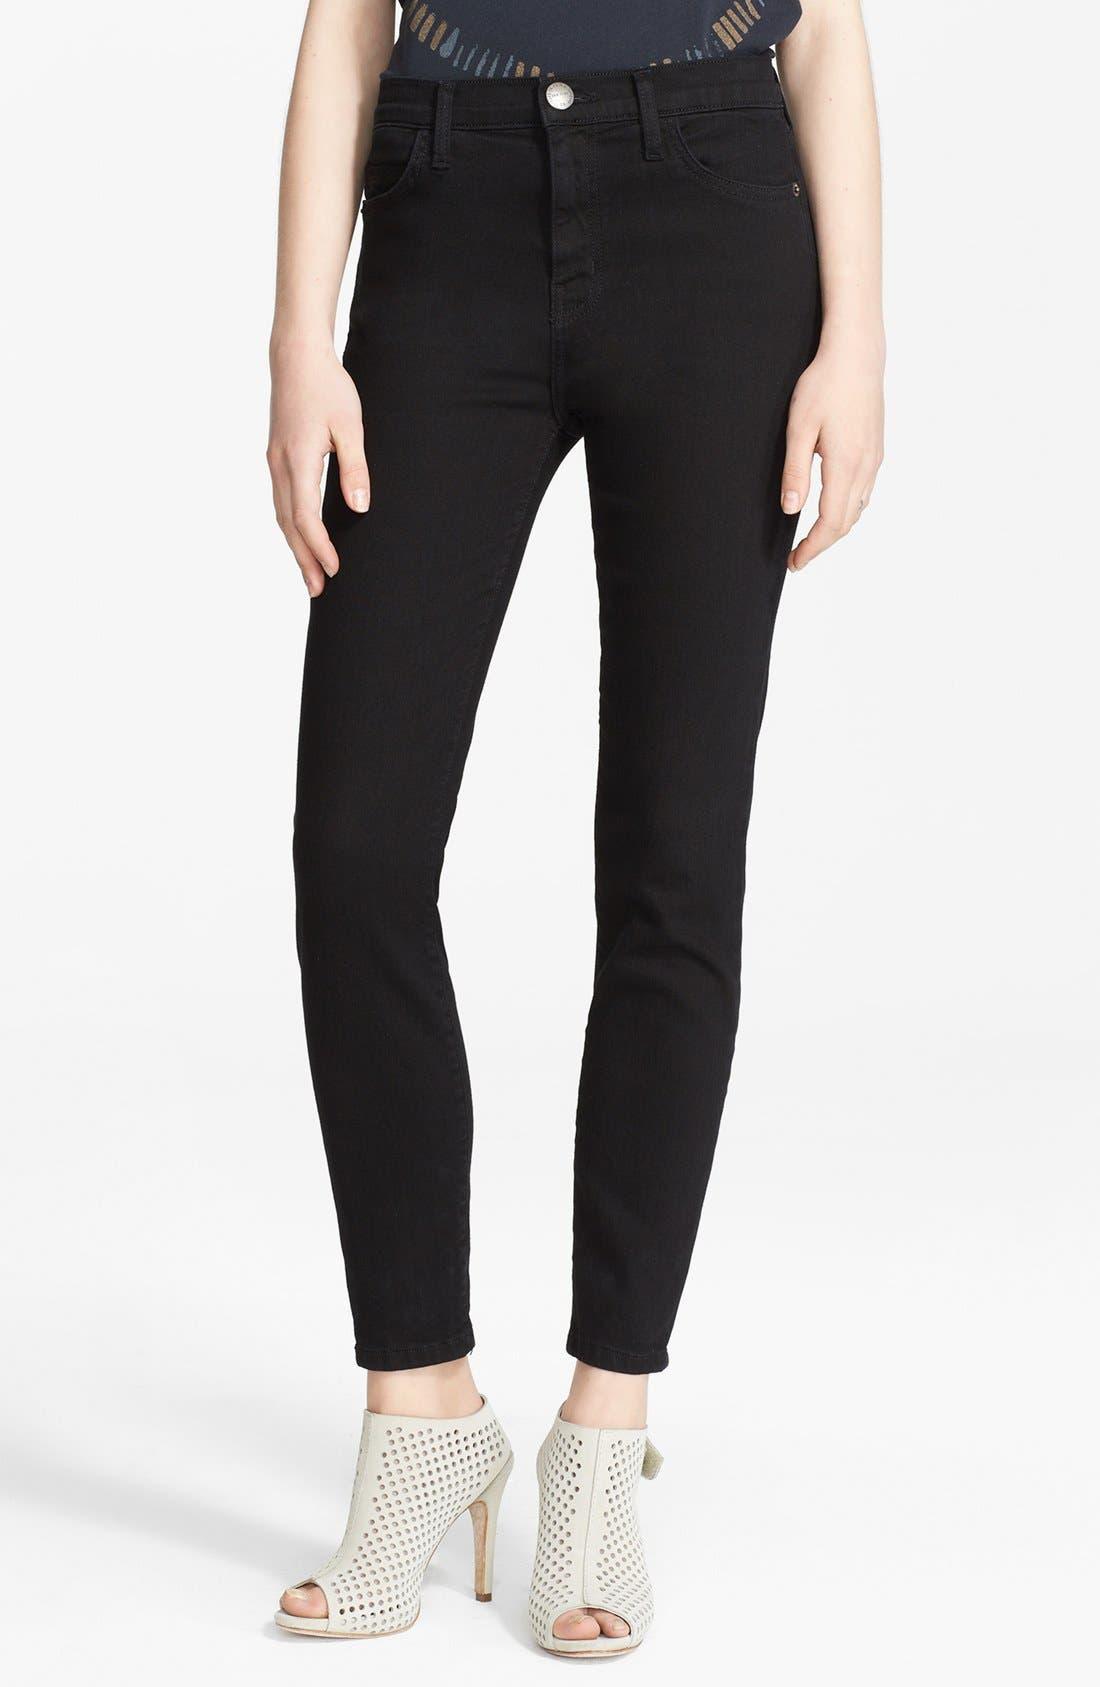 Main Image - Current/Elliott The Stiletto Skinny Jeans